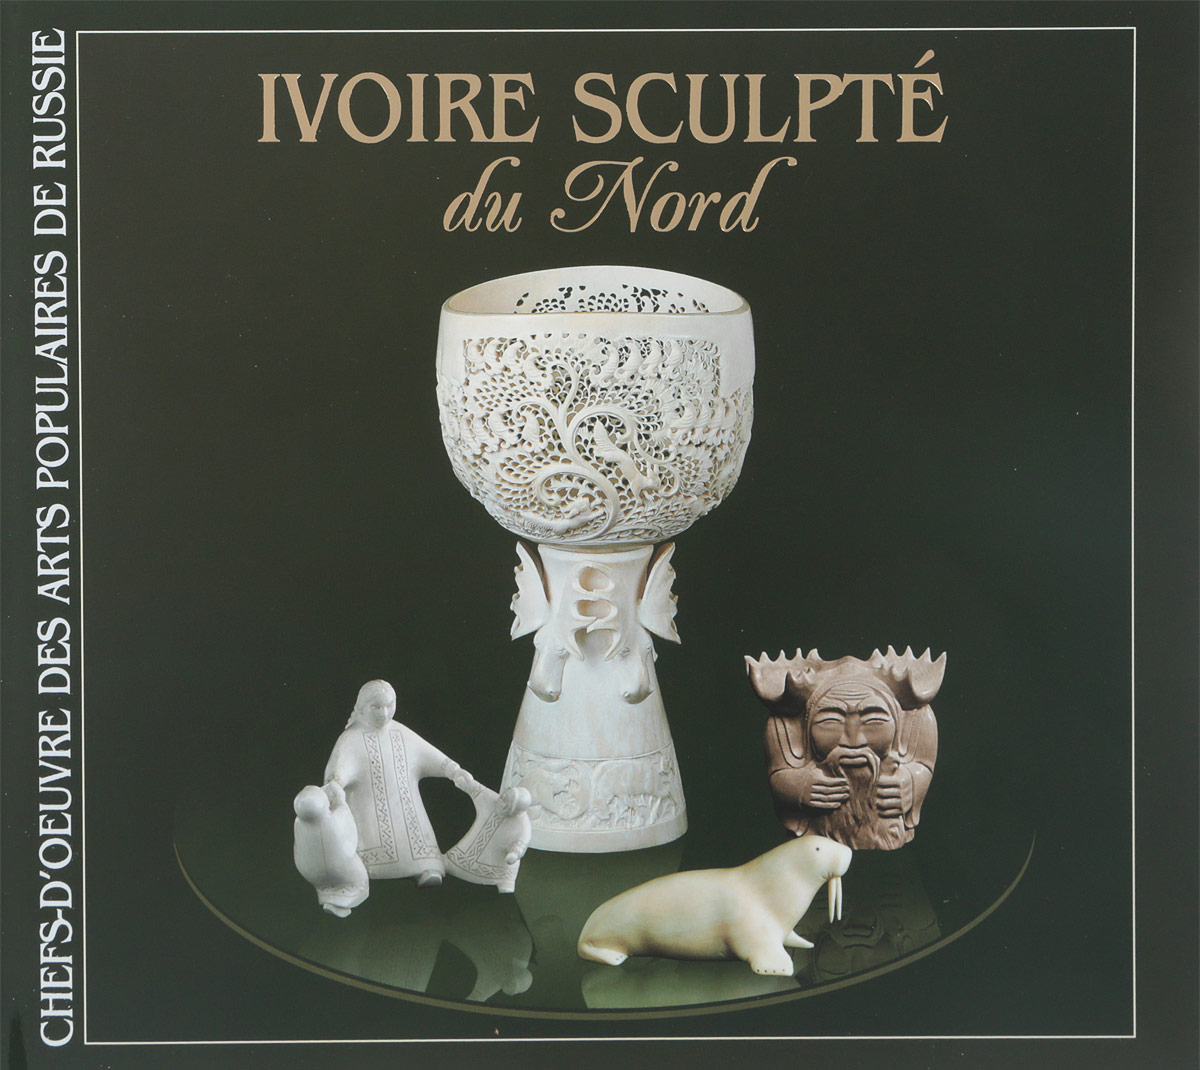 Северная резная кость / Ivoire Sculpte du Nord (на французском языке)